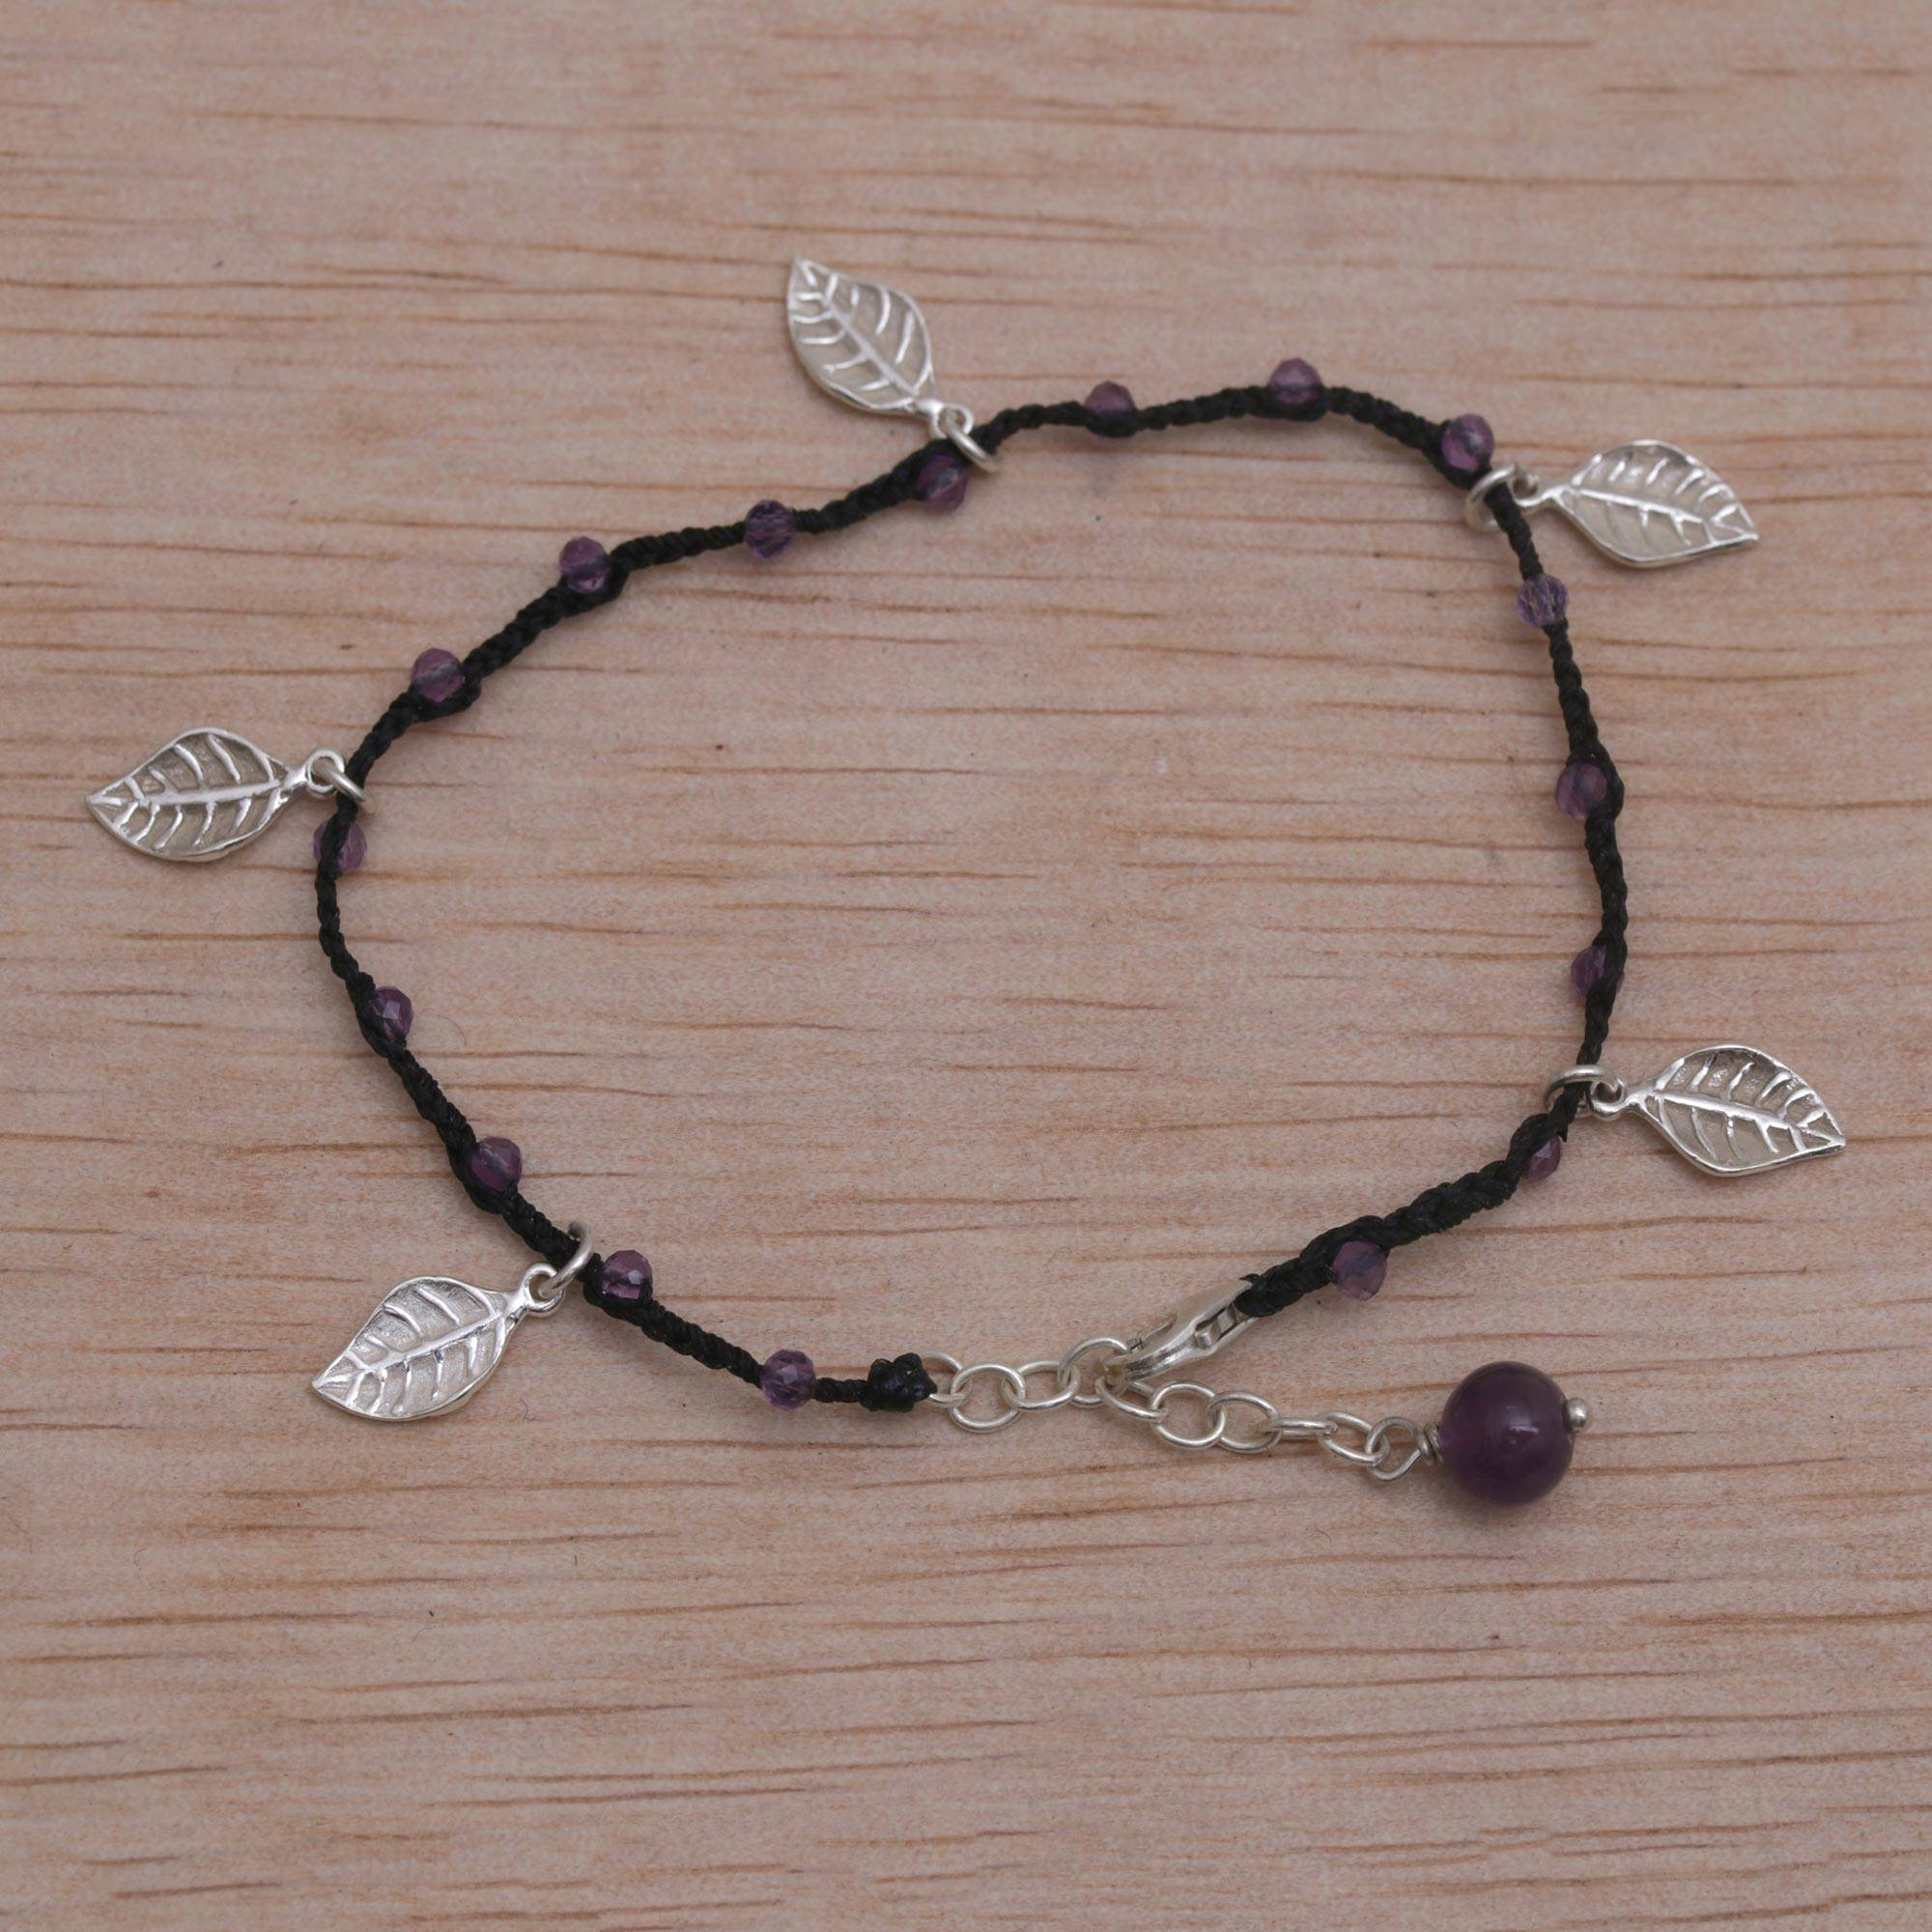 Amethyst Crystal Gemstone Heart Pendant Black Cord Necklace Jewellery 1.5cm